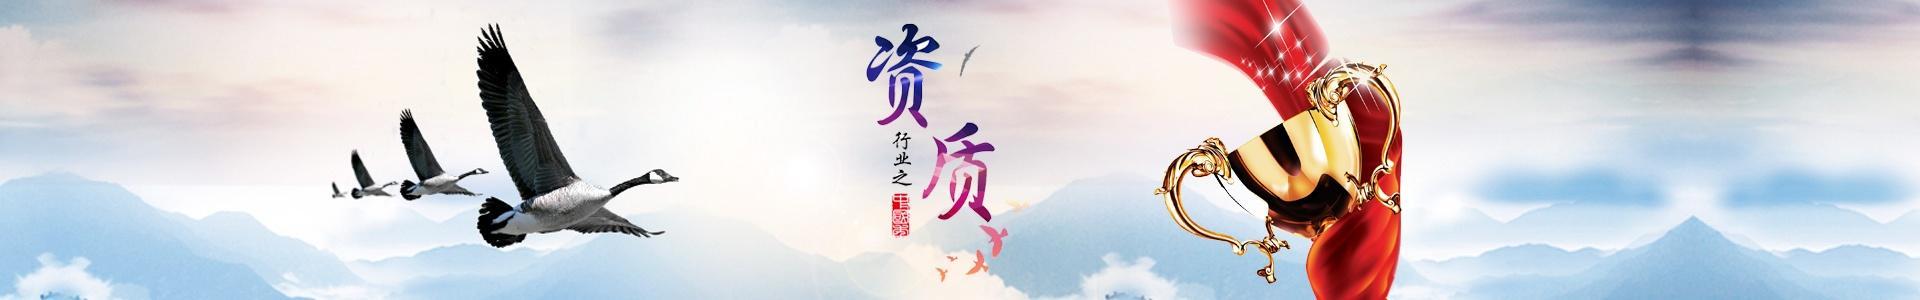 banner_1920x300_企业资质_01_a